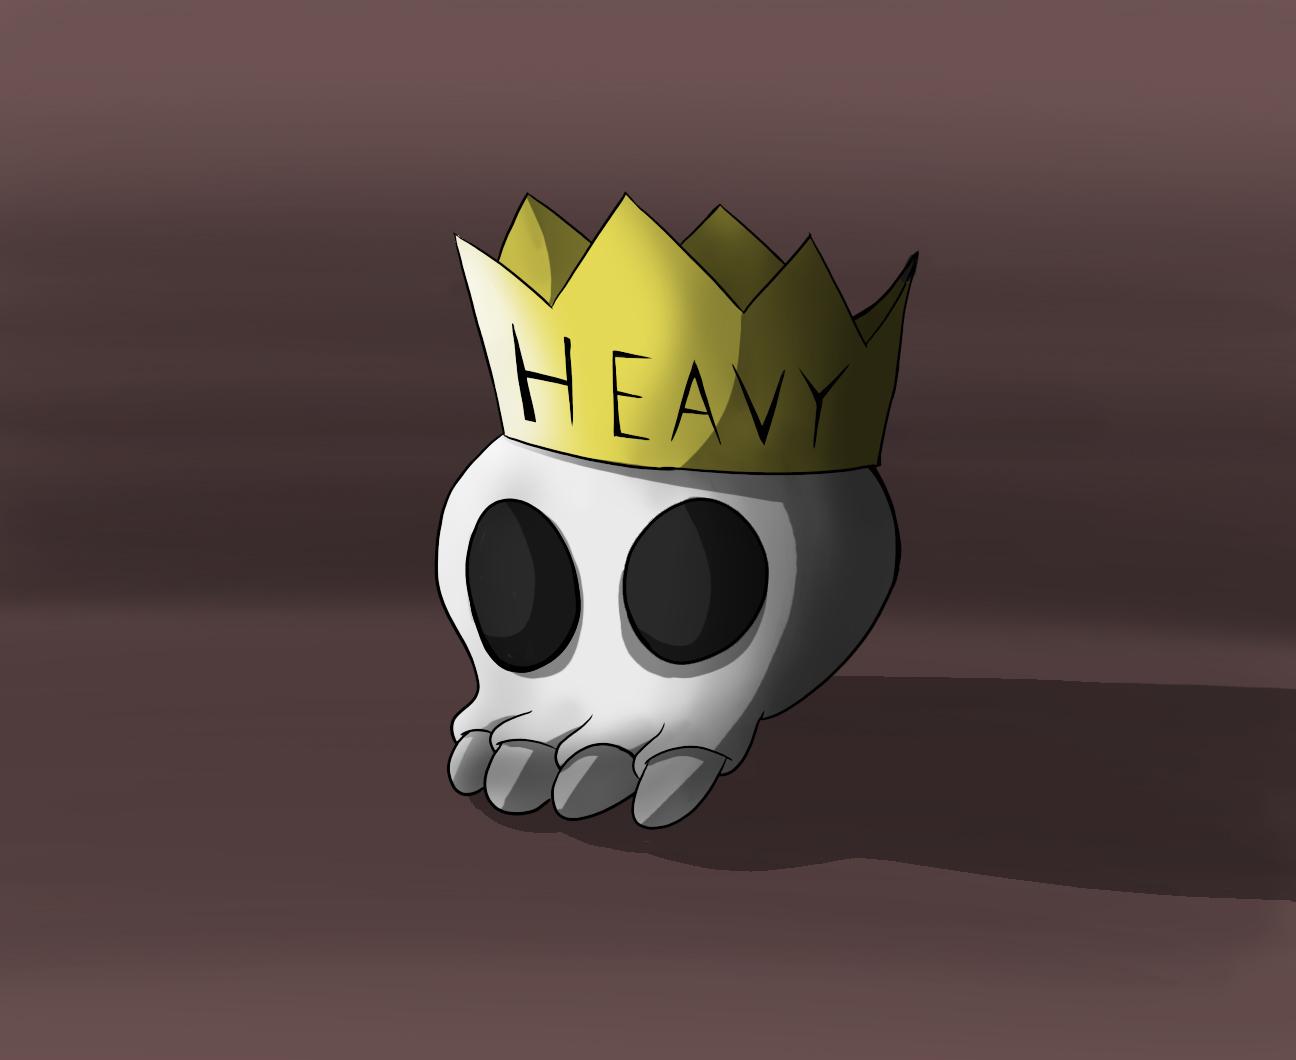 That's heavy man